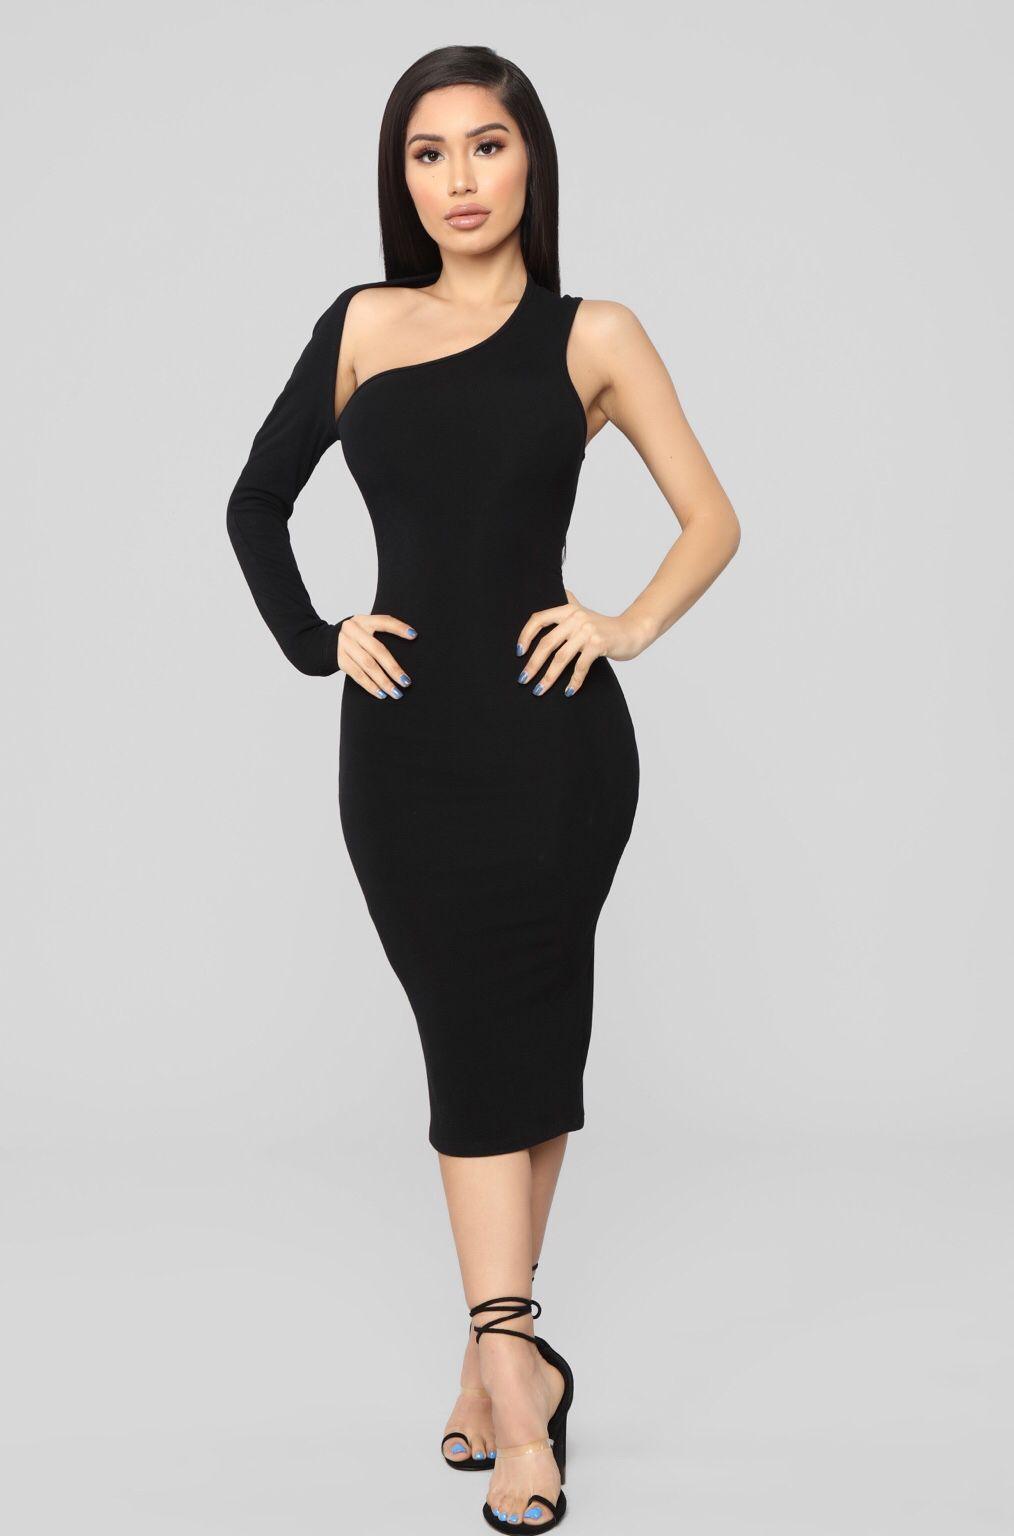 a901701301105 One Of A Kind Asymmetrical Dress - Black in 2019